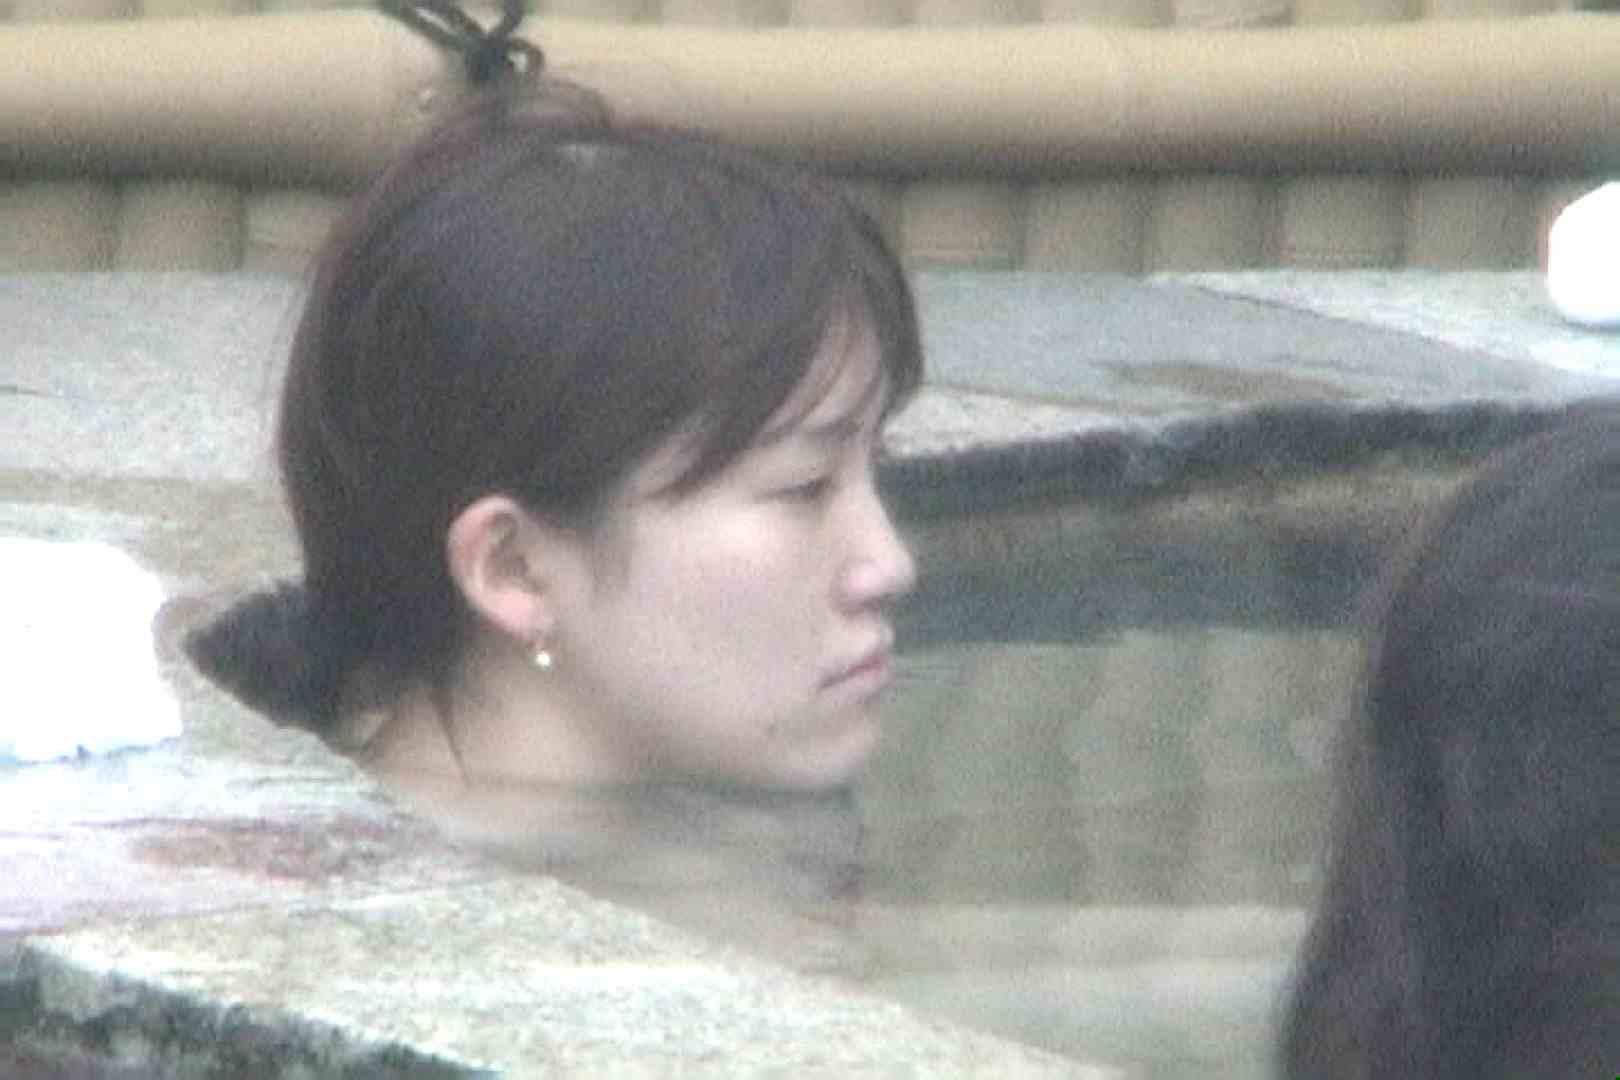 Aquaな露天風呂Vol.79【VIP限定】 盗撮 | HなOL  100pic 57